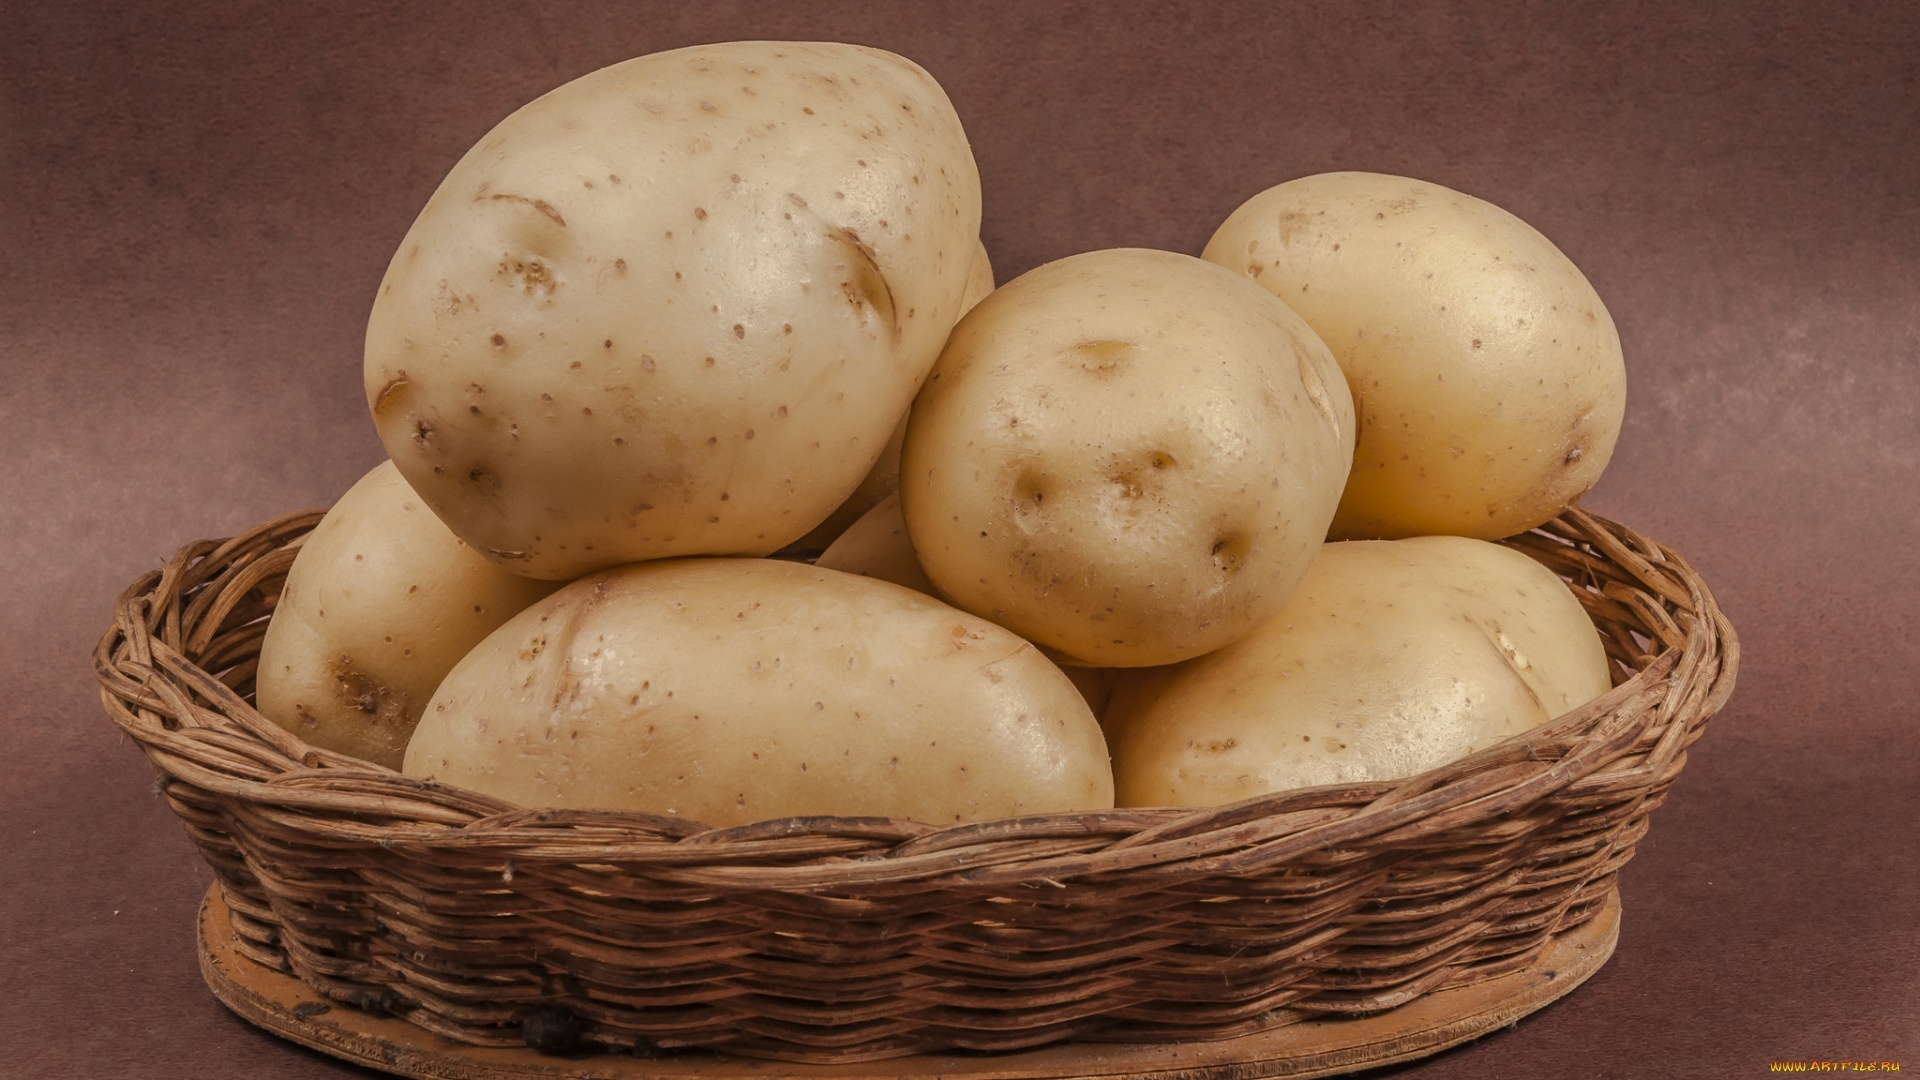 Potatoes Wallpaper image hd